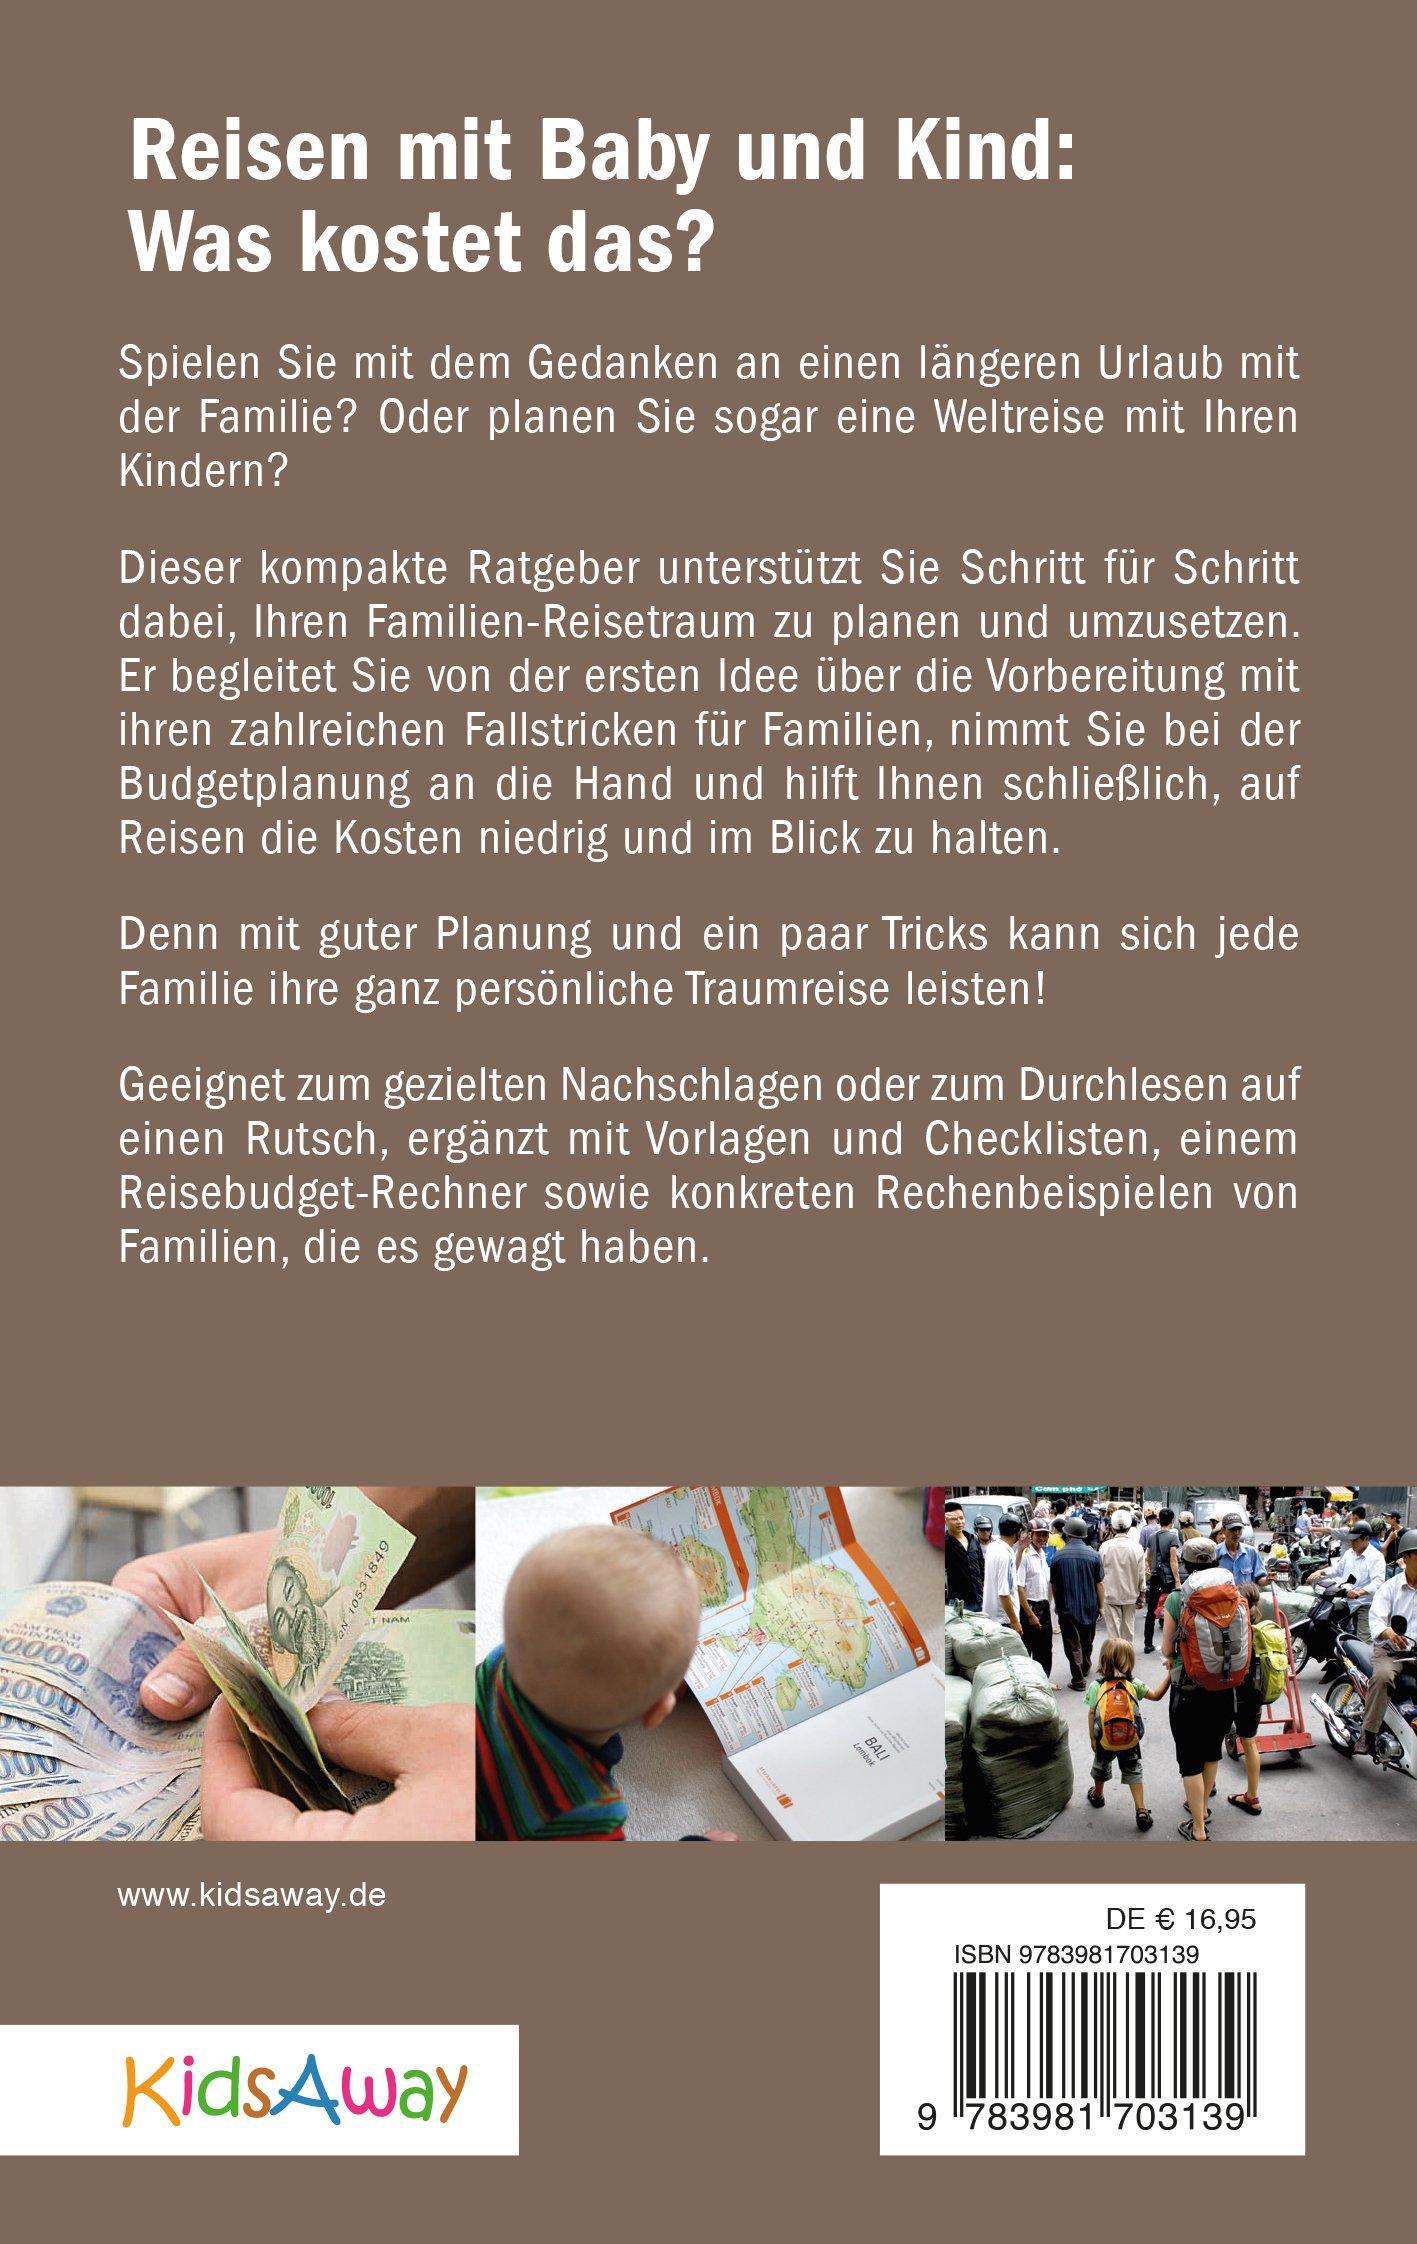 Reisebudget-Planung für Familien - Cover Rückseite © KidsAway.de